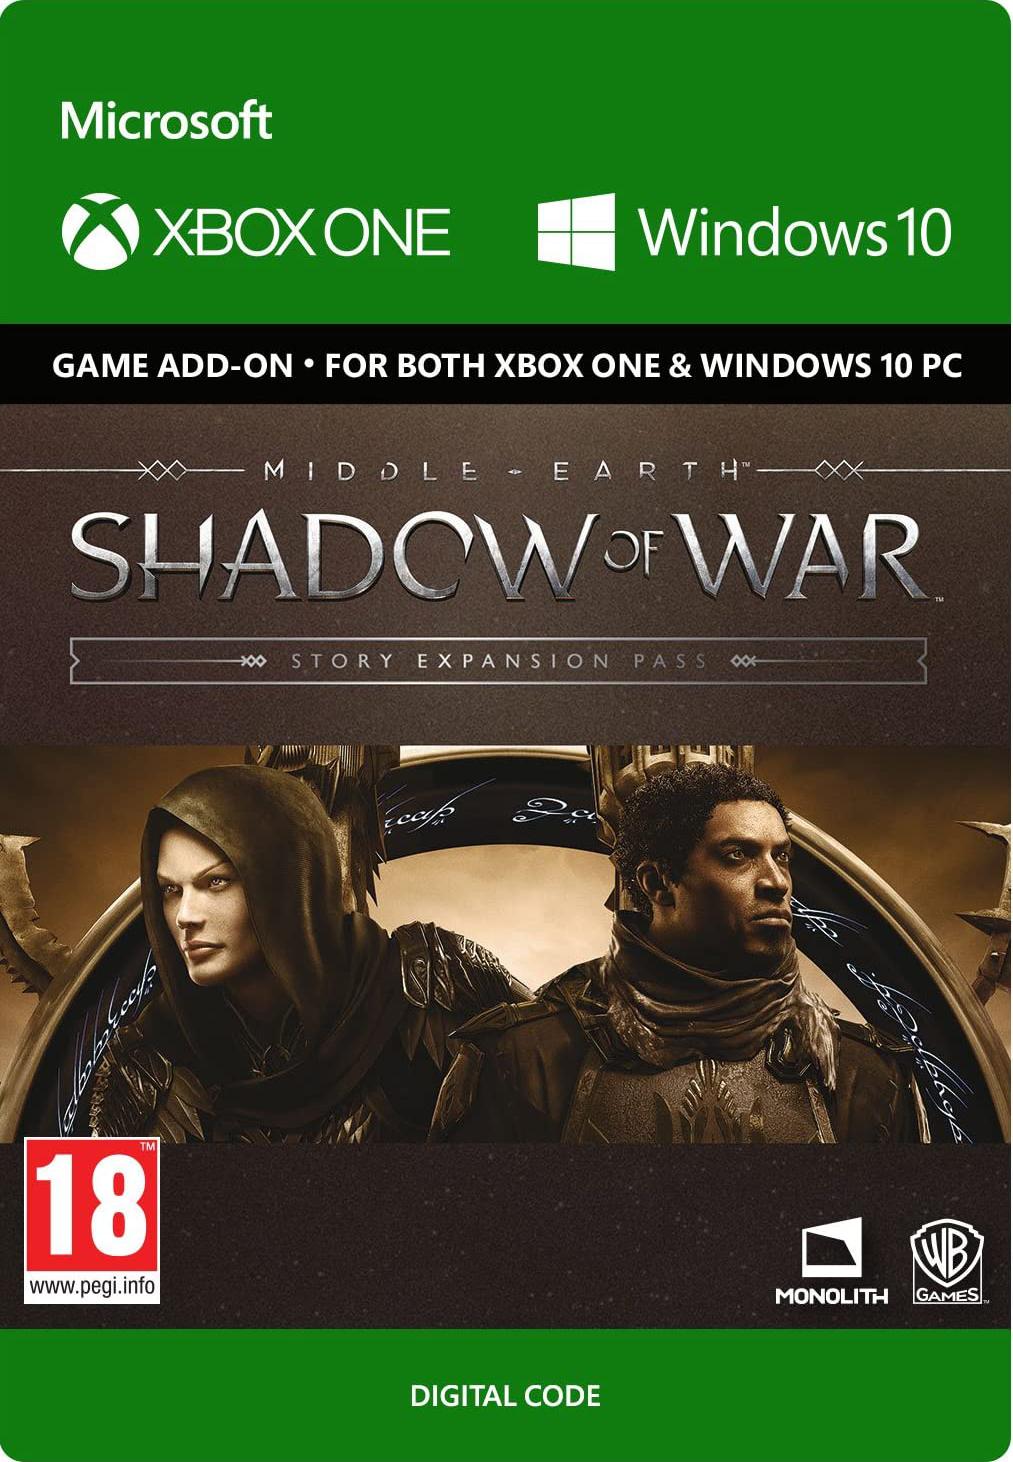 Фото - Средиземье: Тени войны (Middle-earth: Shadow of War) Story Expansion Pass. Дополнение [Xbox One/Win10, Цифровая версия] (Цифровая версия) средиземье тени войны middle earth shadow of war the blade of galadriel story expansion дополнение [xbox one win10 цифровая версия] цифровая версия